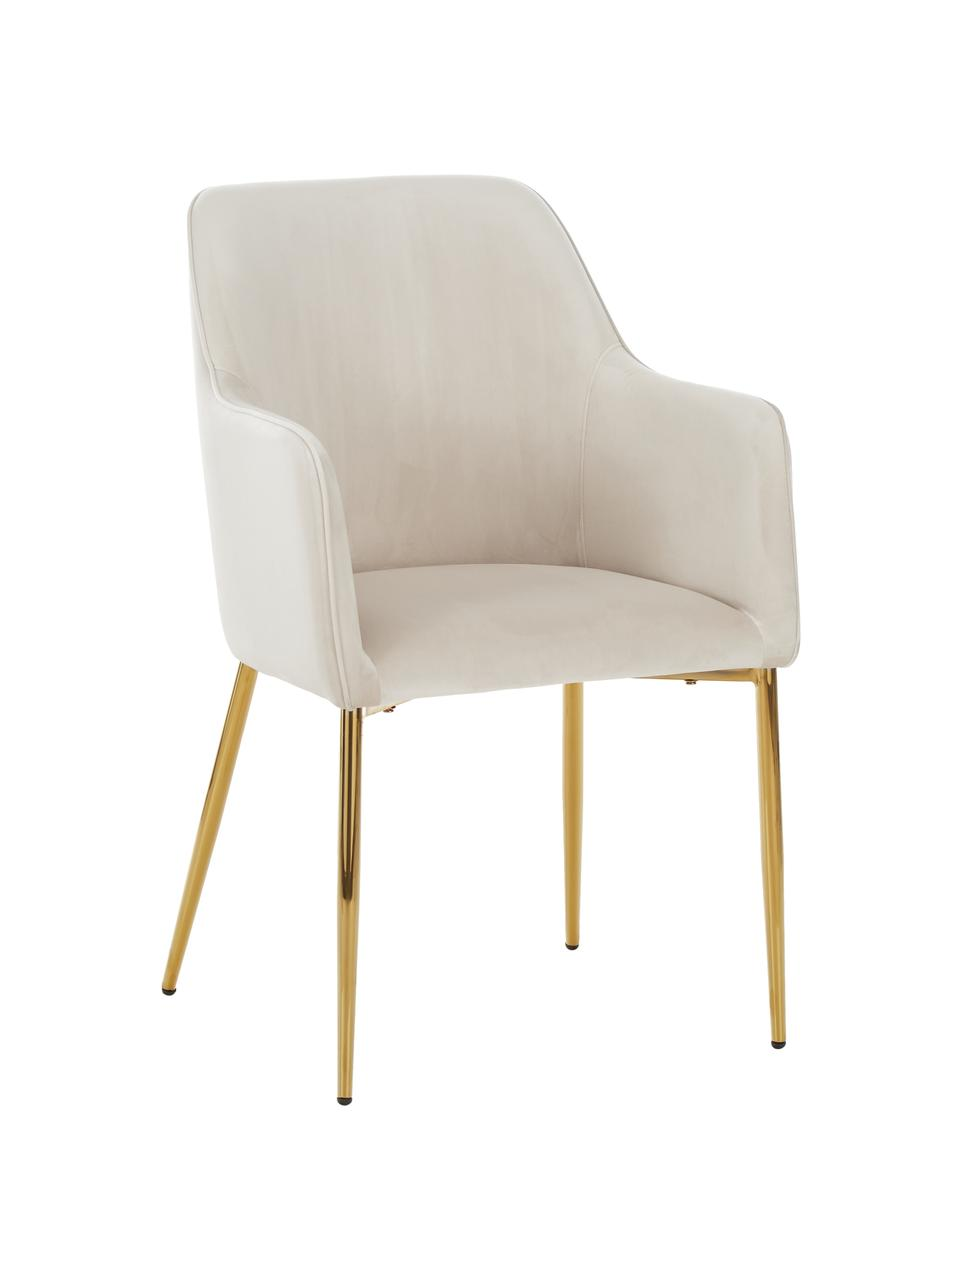 Chaise velours moderne pieds dorés Ava, Velours beige, pieds or